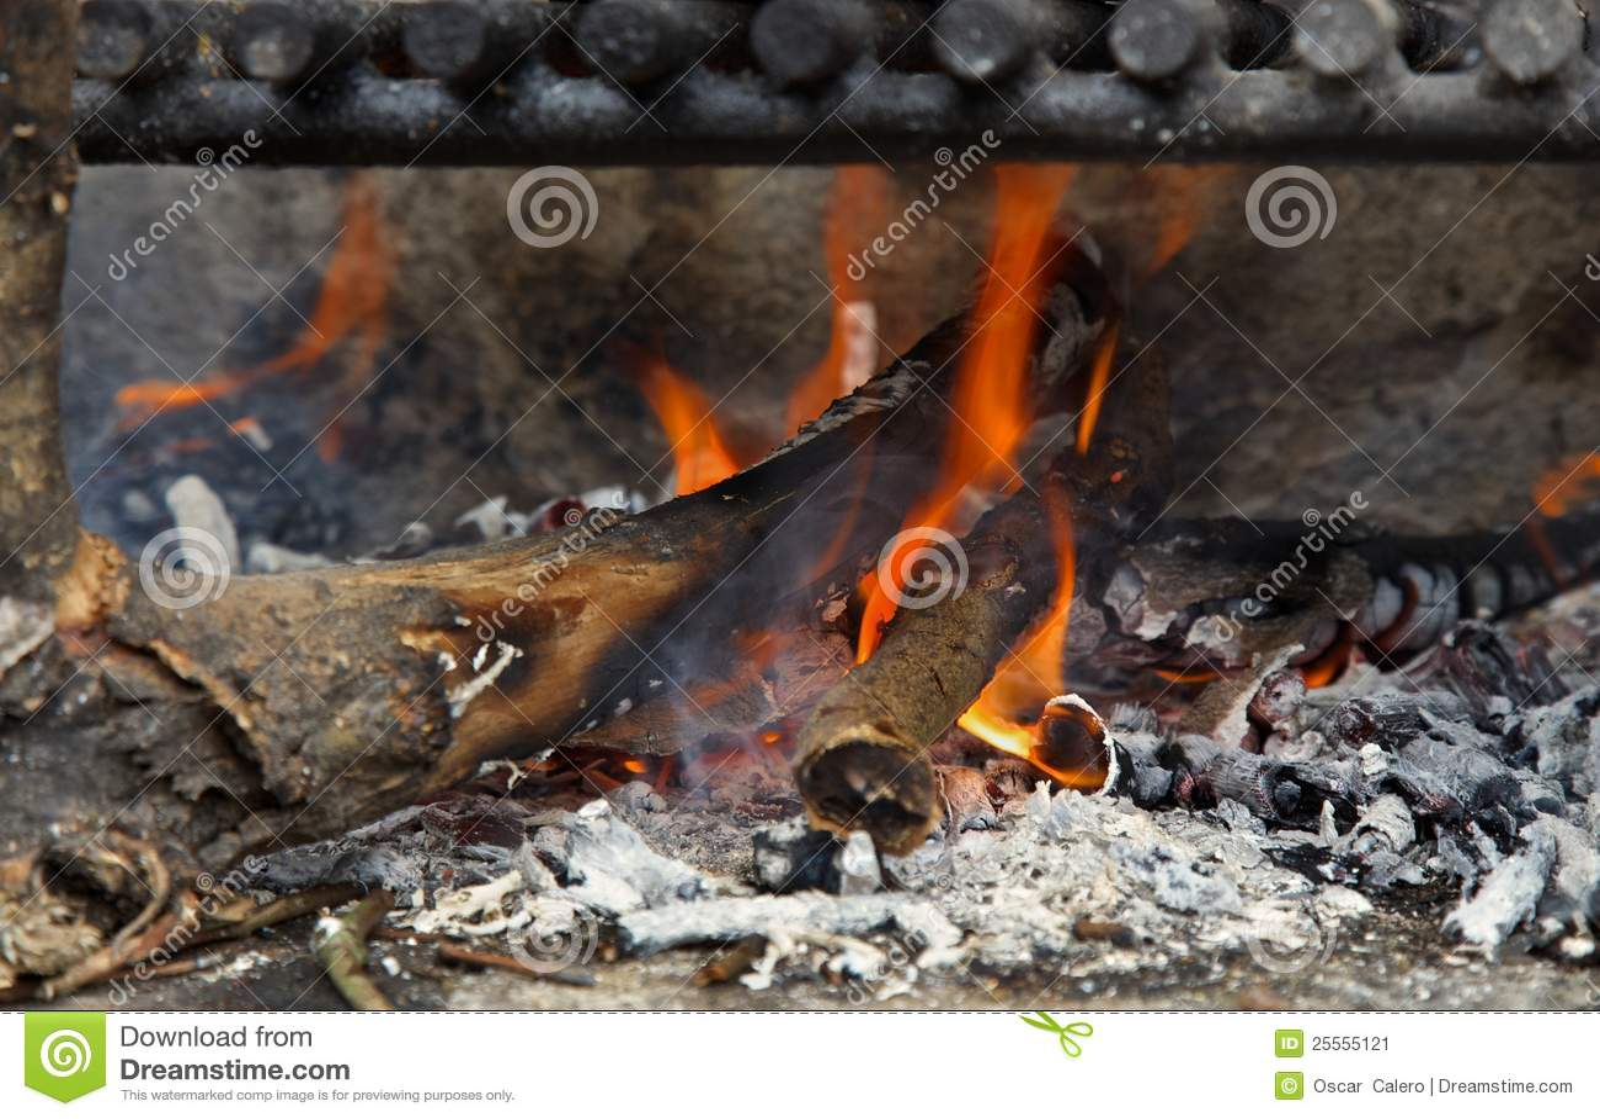 Grillfestbrand